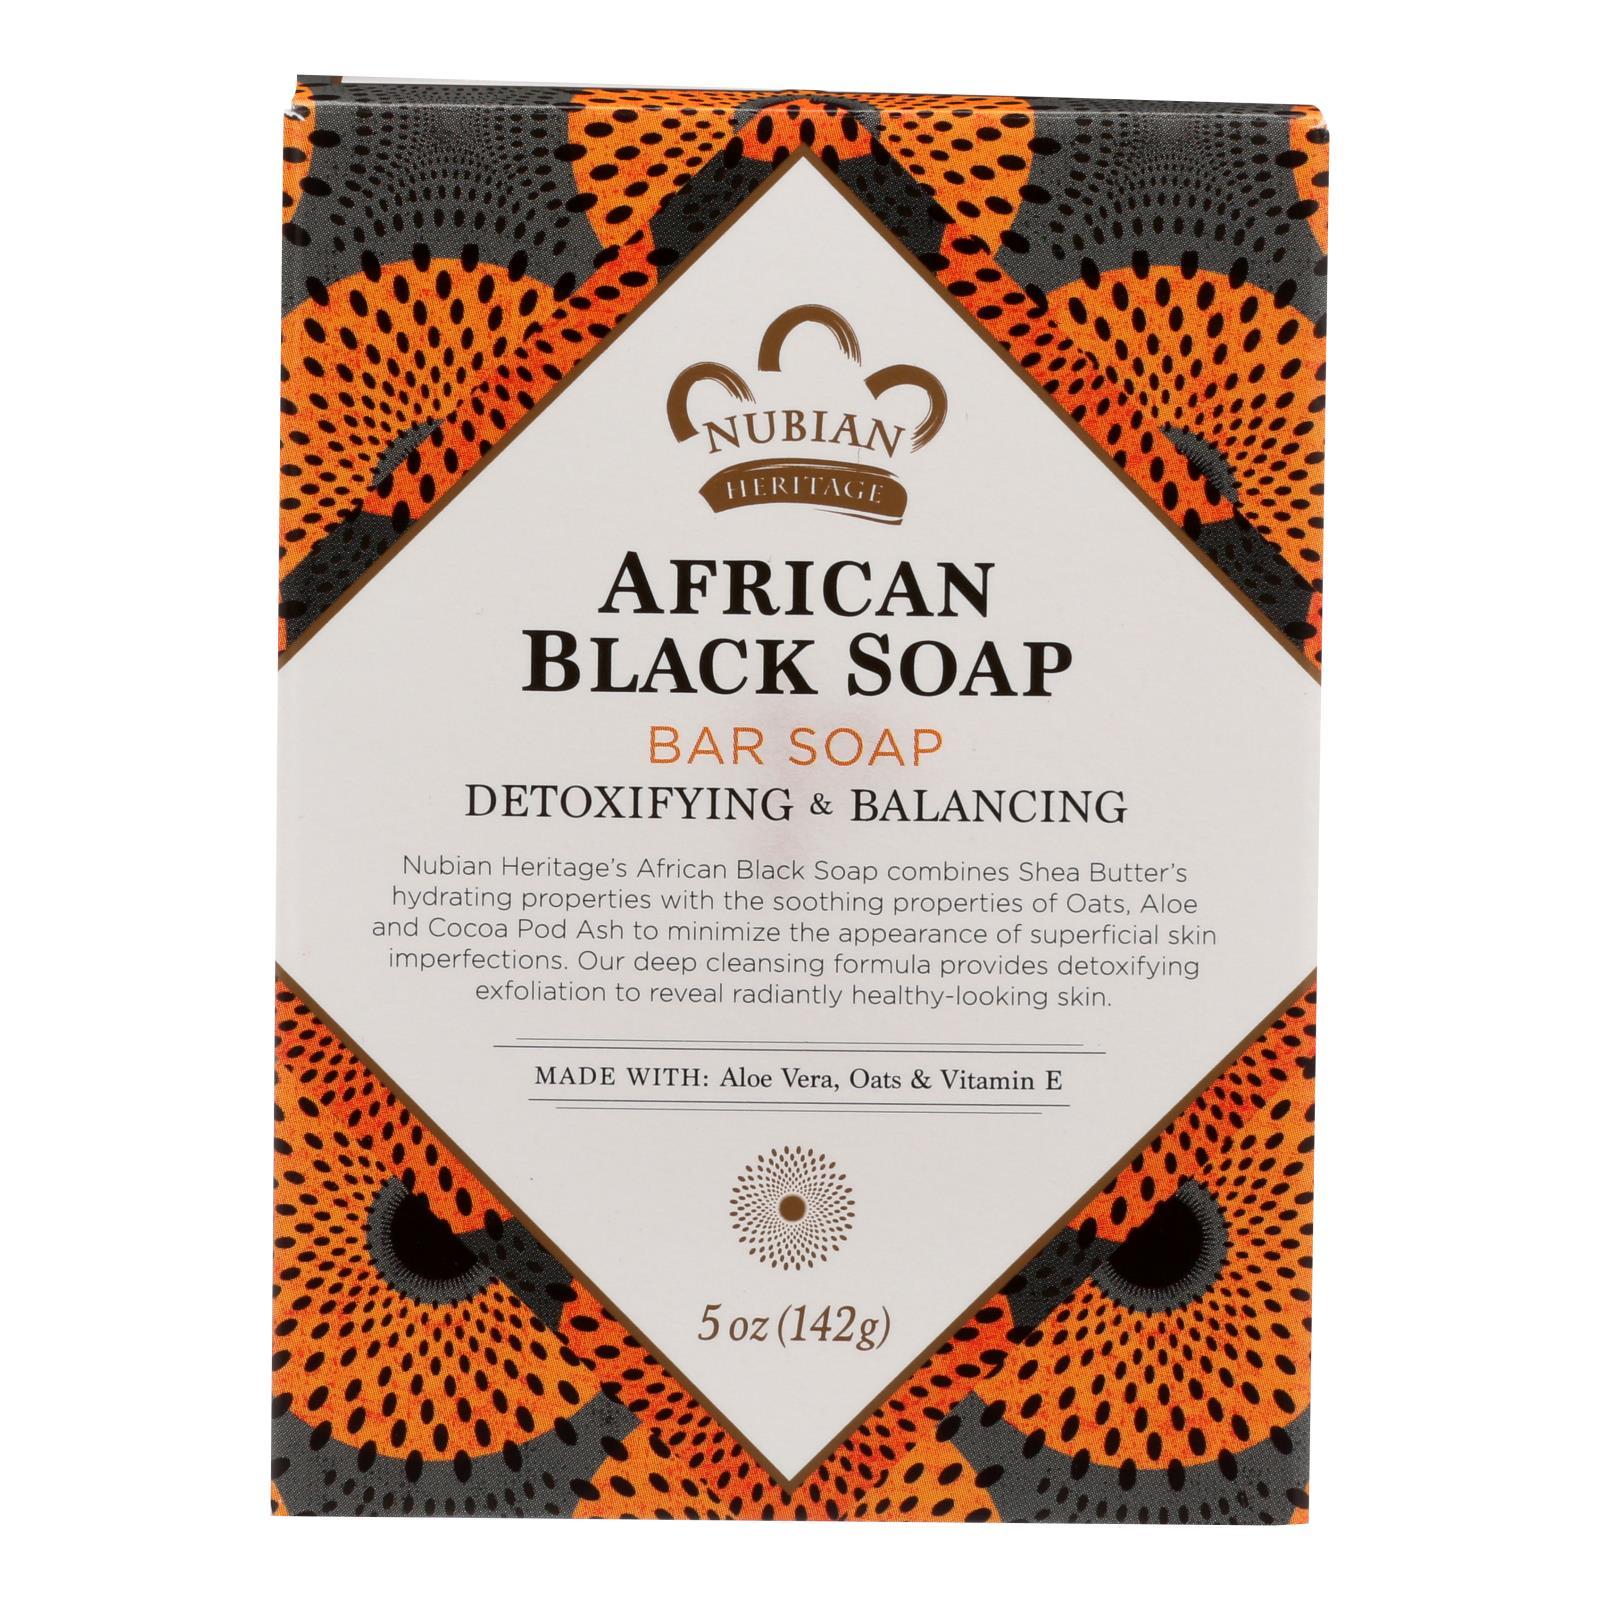 Nubian Heritage Bar Soap African Black - 5 oz